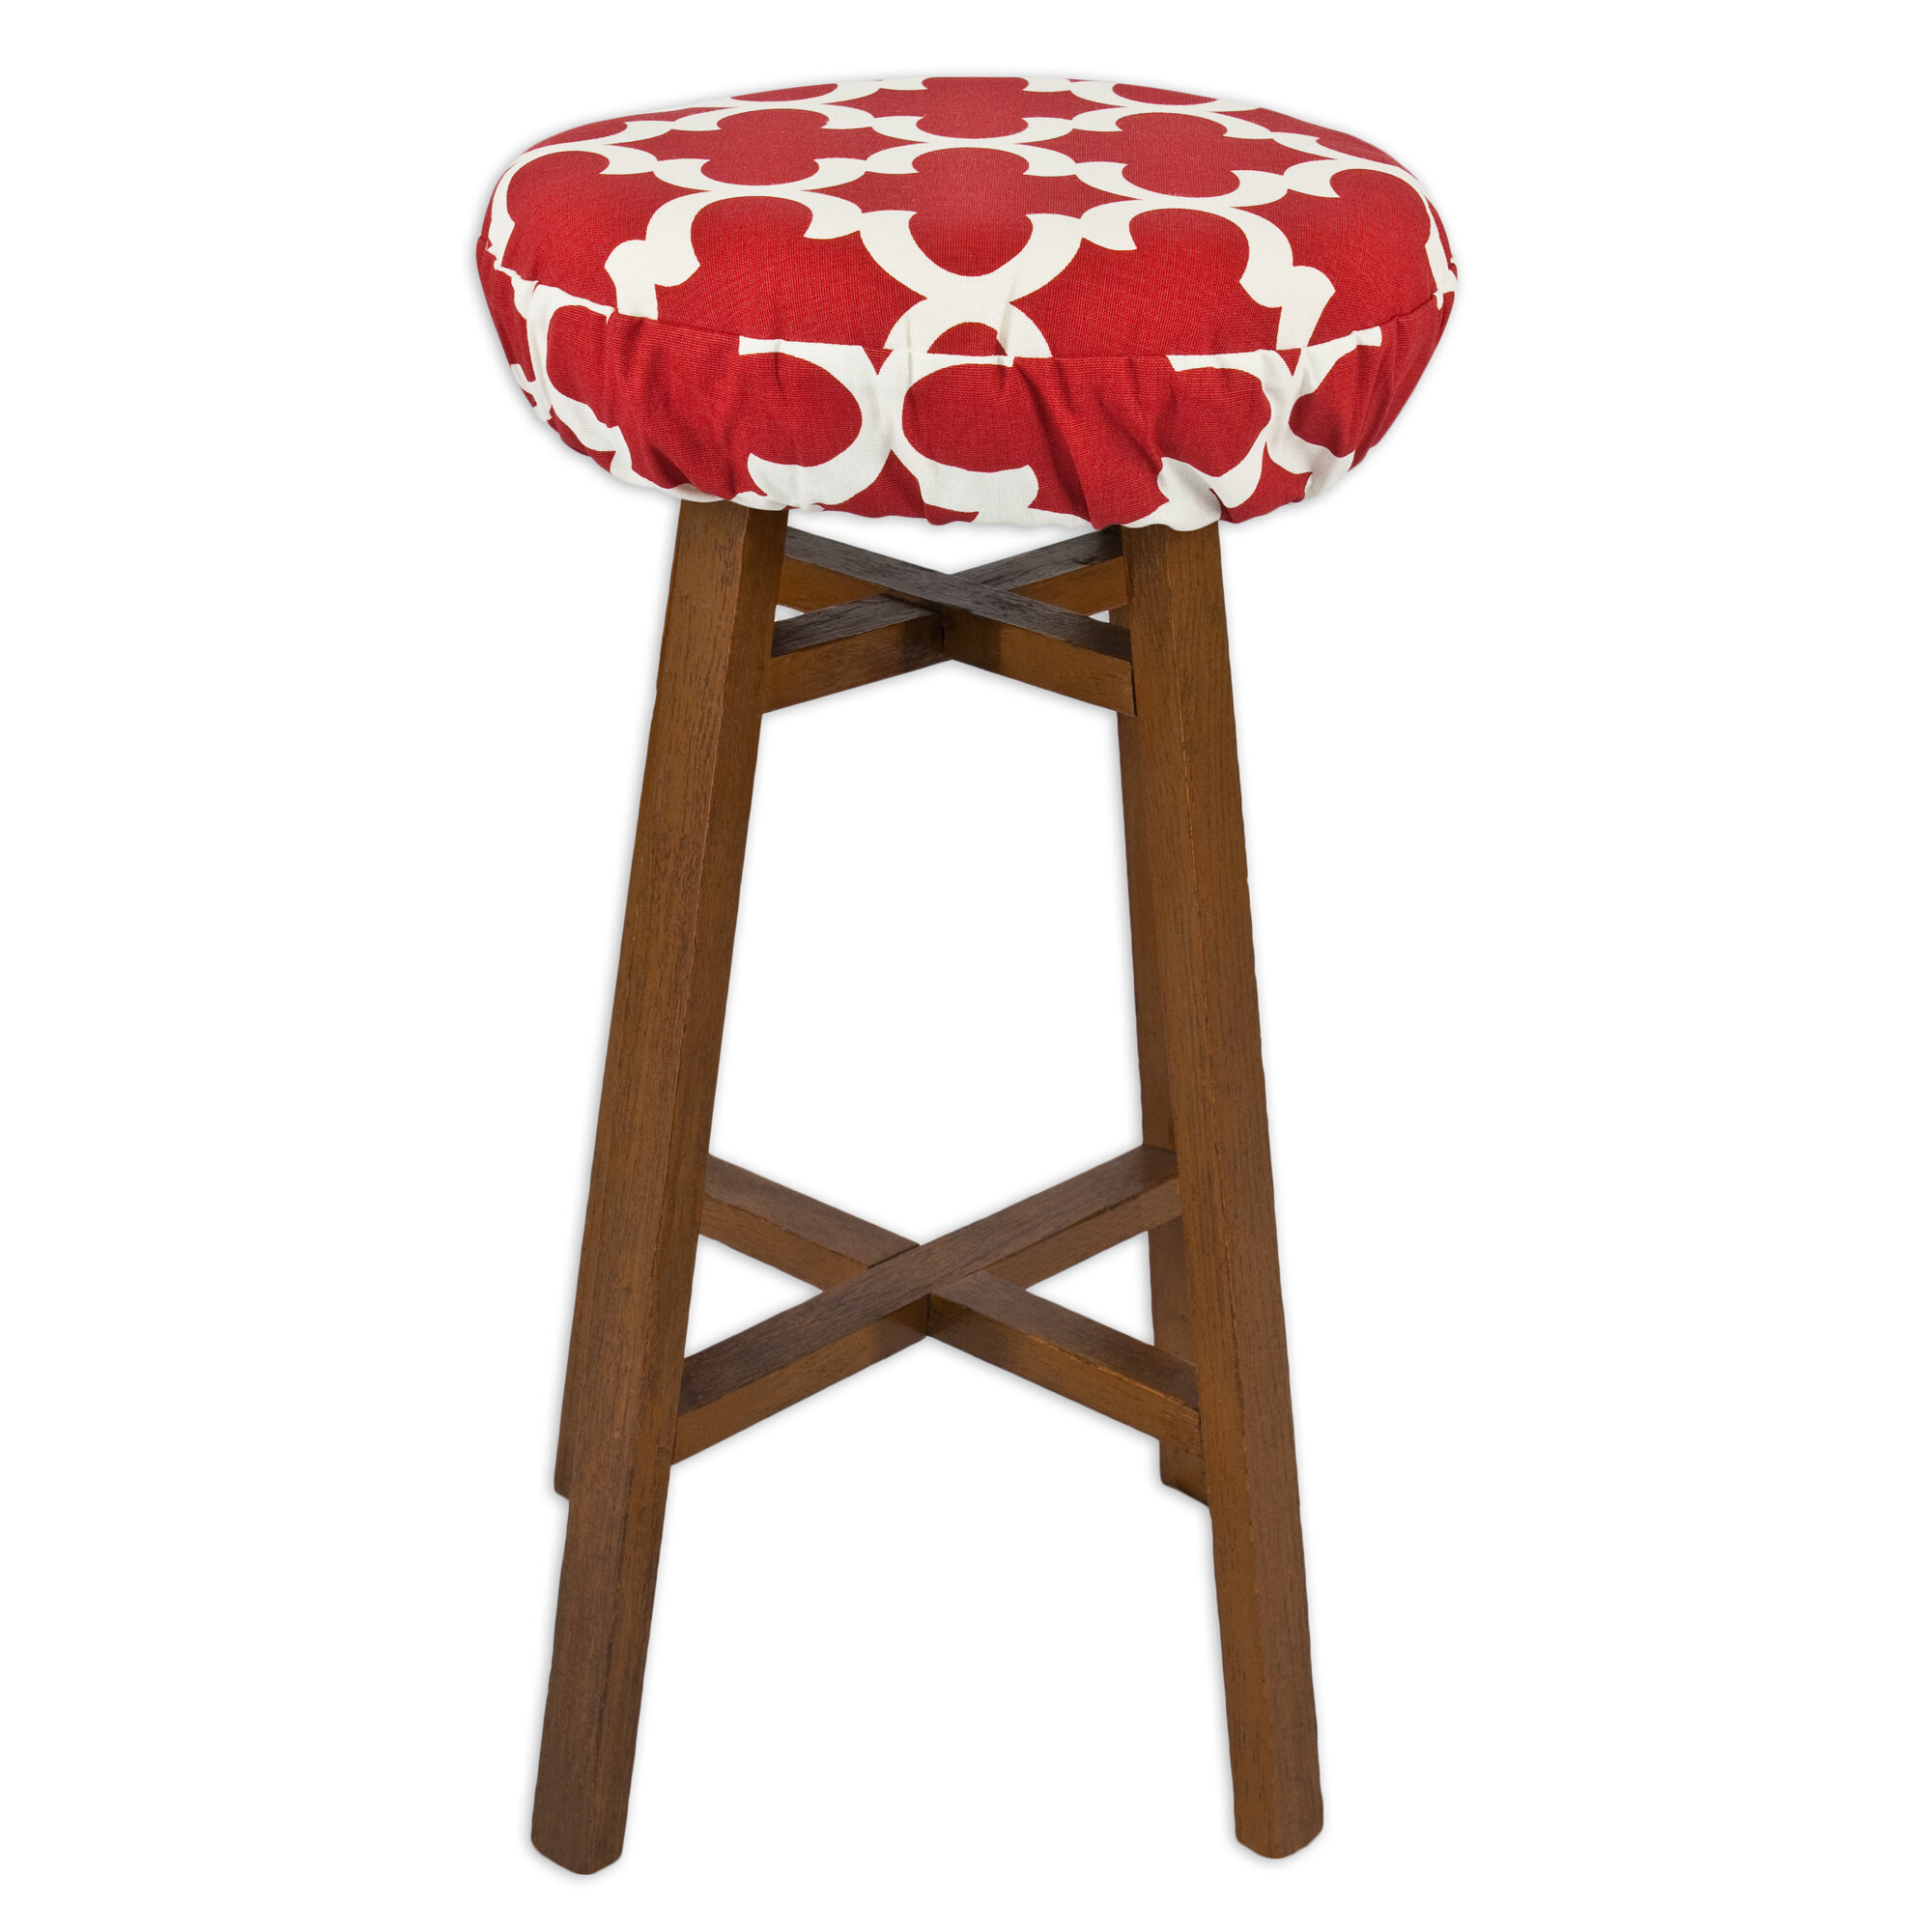 bar stool NEW 418 BAR STOOL CUSHION ROUND : 1 from barstools2.blogspot.com size 2000 x 2000 jpeg 390kB